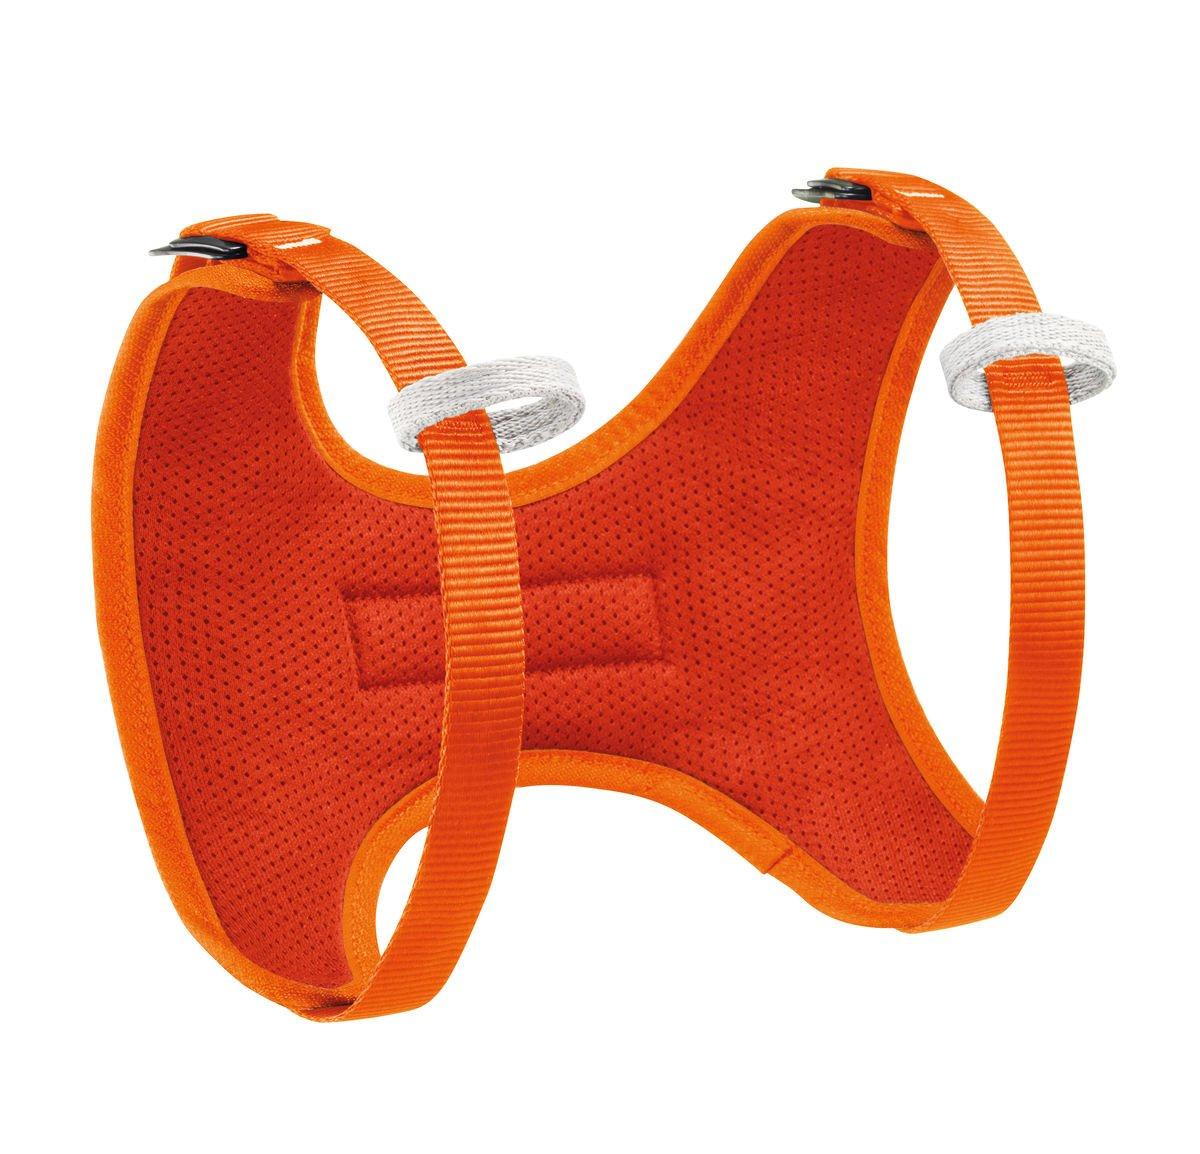 Petzl Klettergurte Body - Arnés de escalada, color naranja, talla one size C18AC